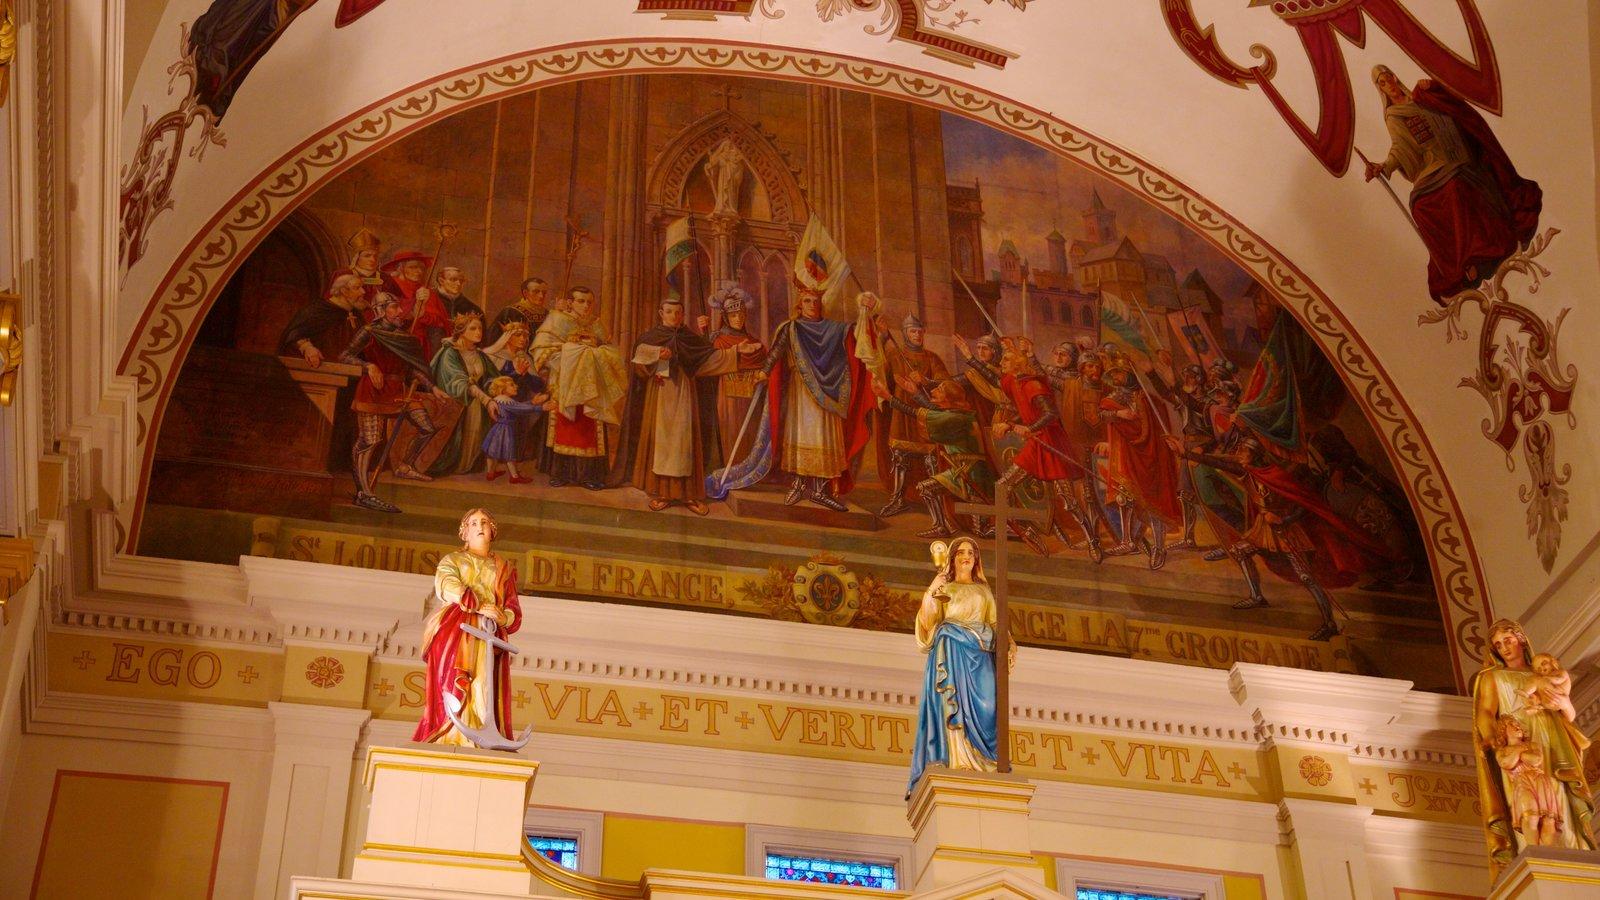 Saint Louis Cathedral caracterizando vistas internas, uma igreja ou catedral e elementos religiosos